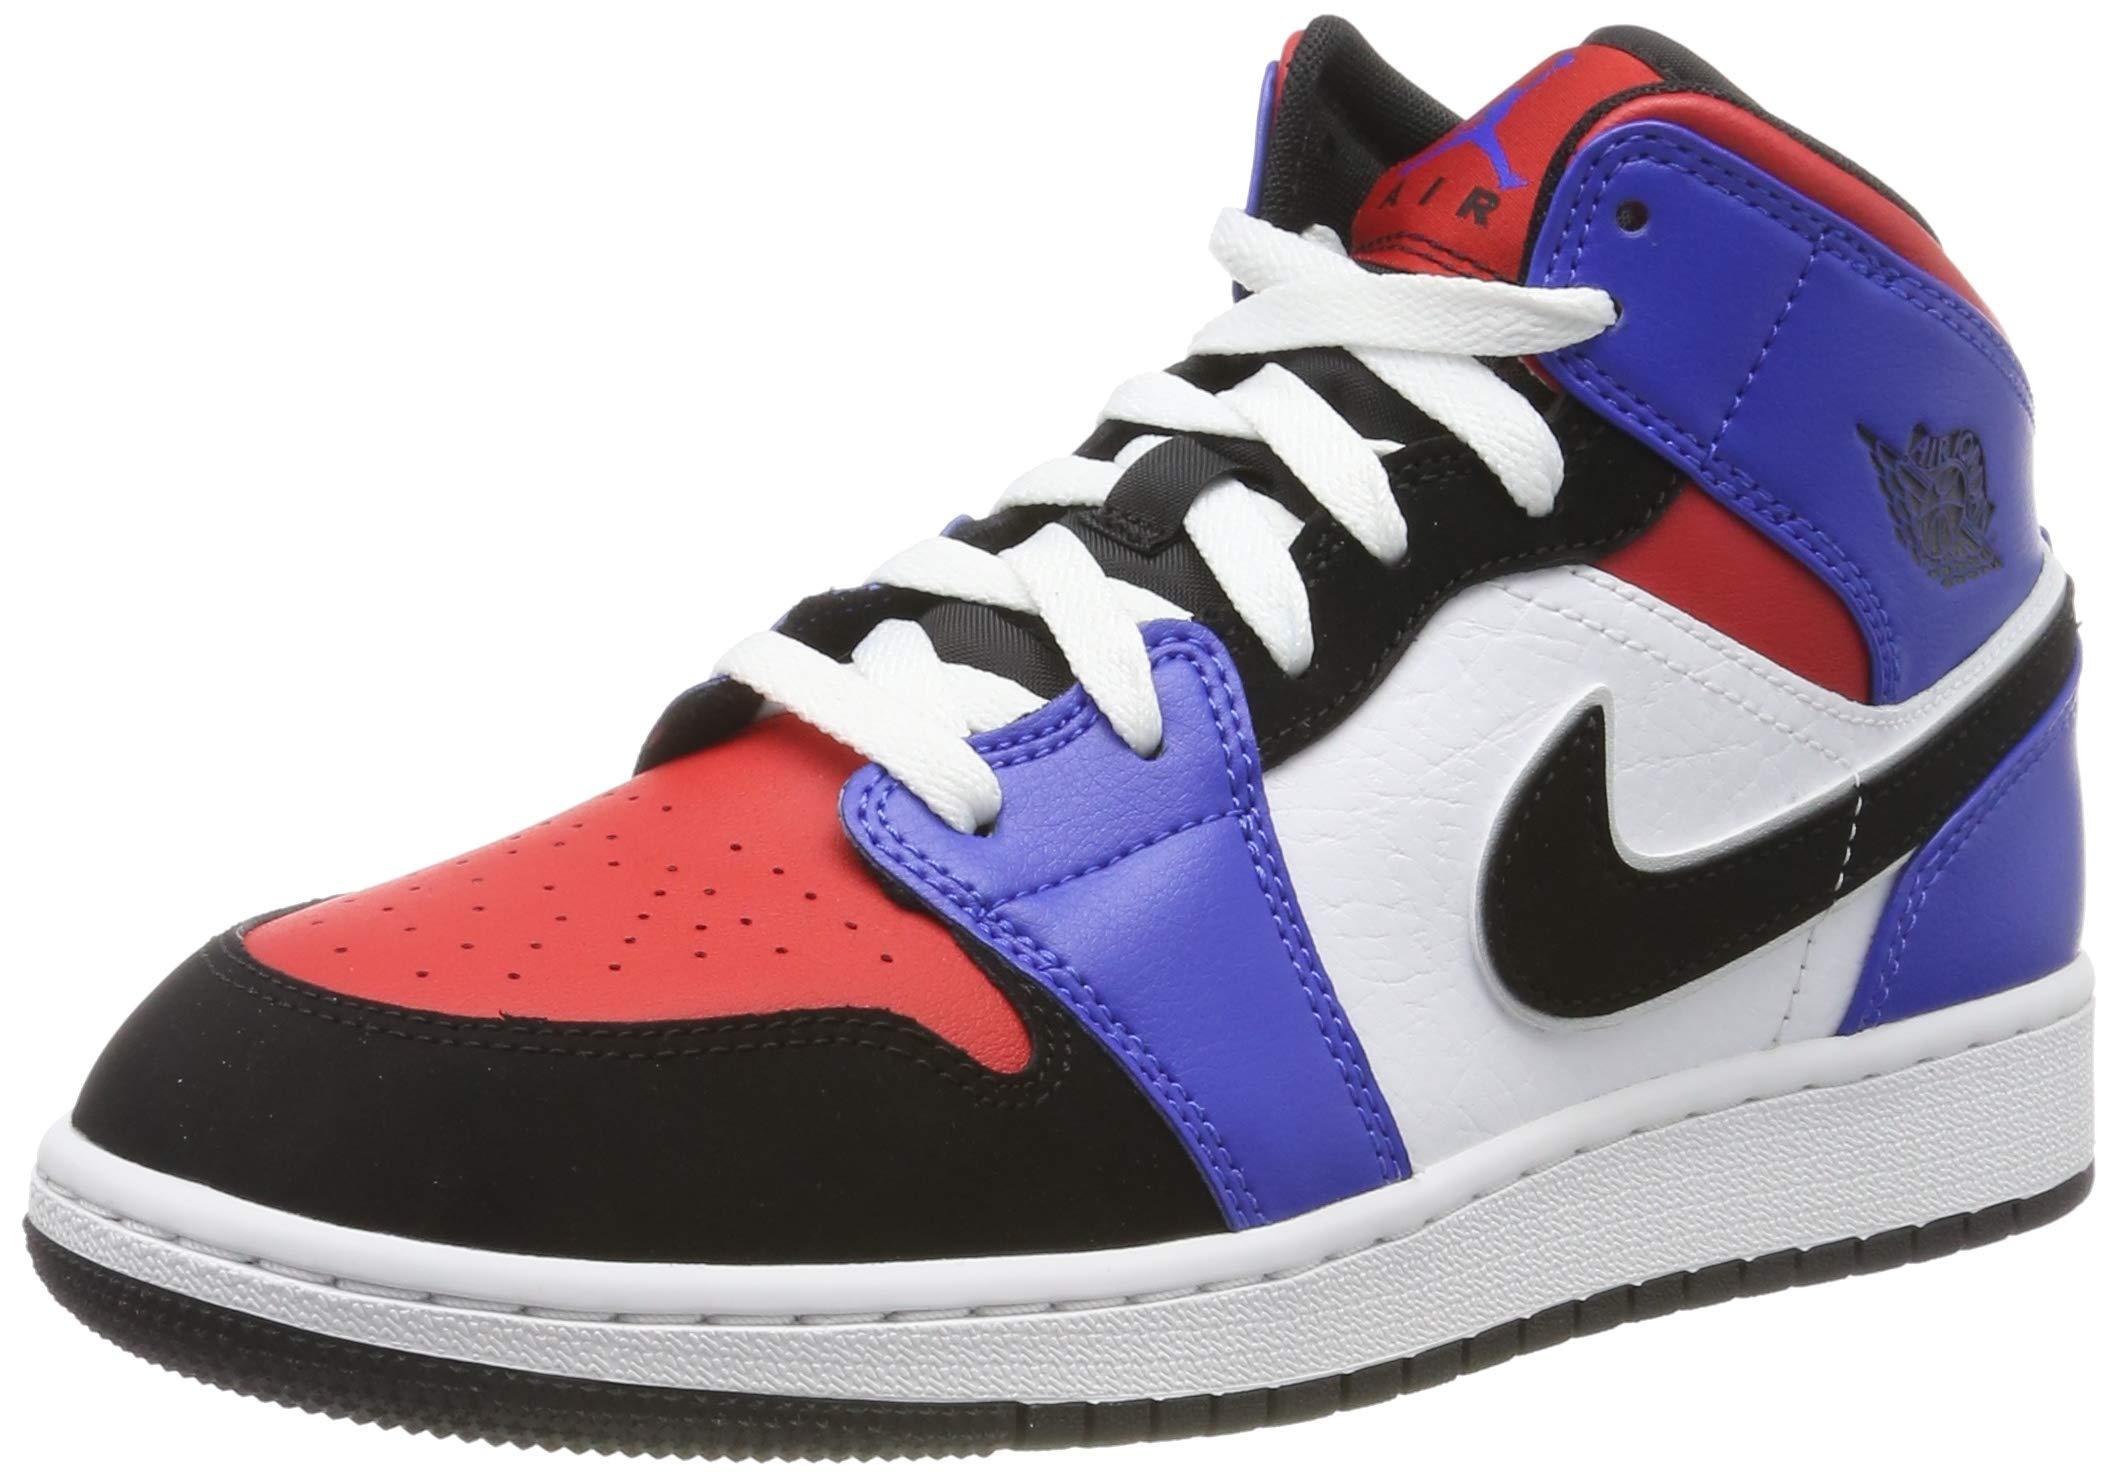 Nike Boy's Air Jordan 1 Mid (GS) Shoe White/Black-Hyper Royal/University Red, Size 3.5 M US Big Kid